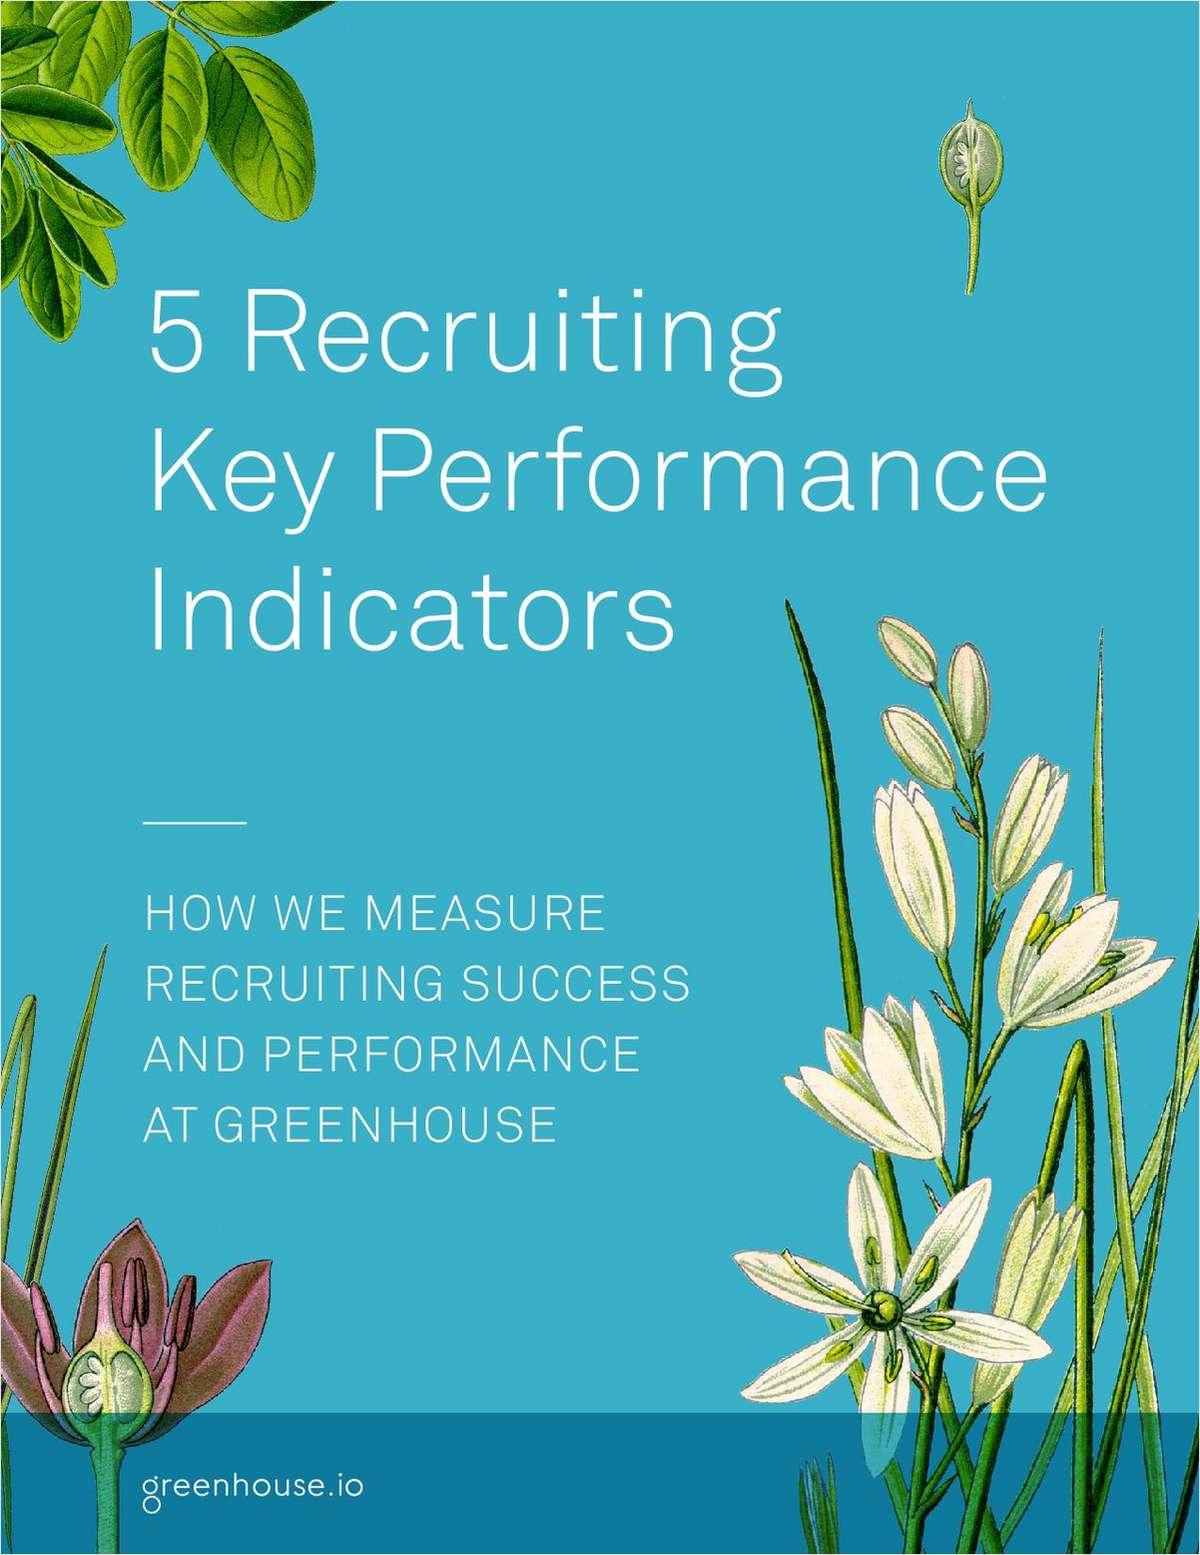 Recruiting Key Performance Indicators - Your 5 Recruiting Metrics